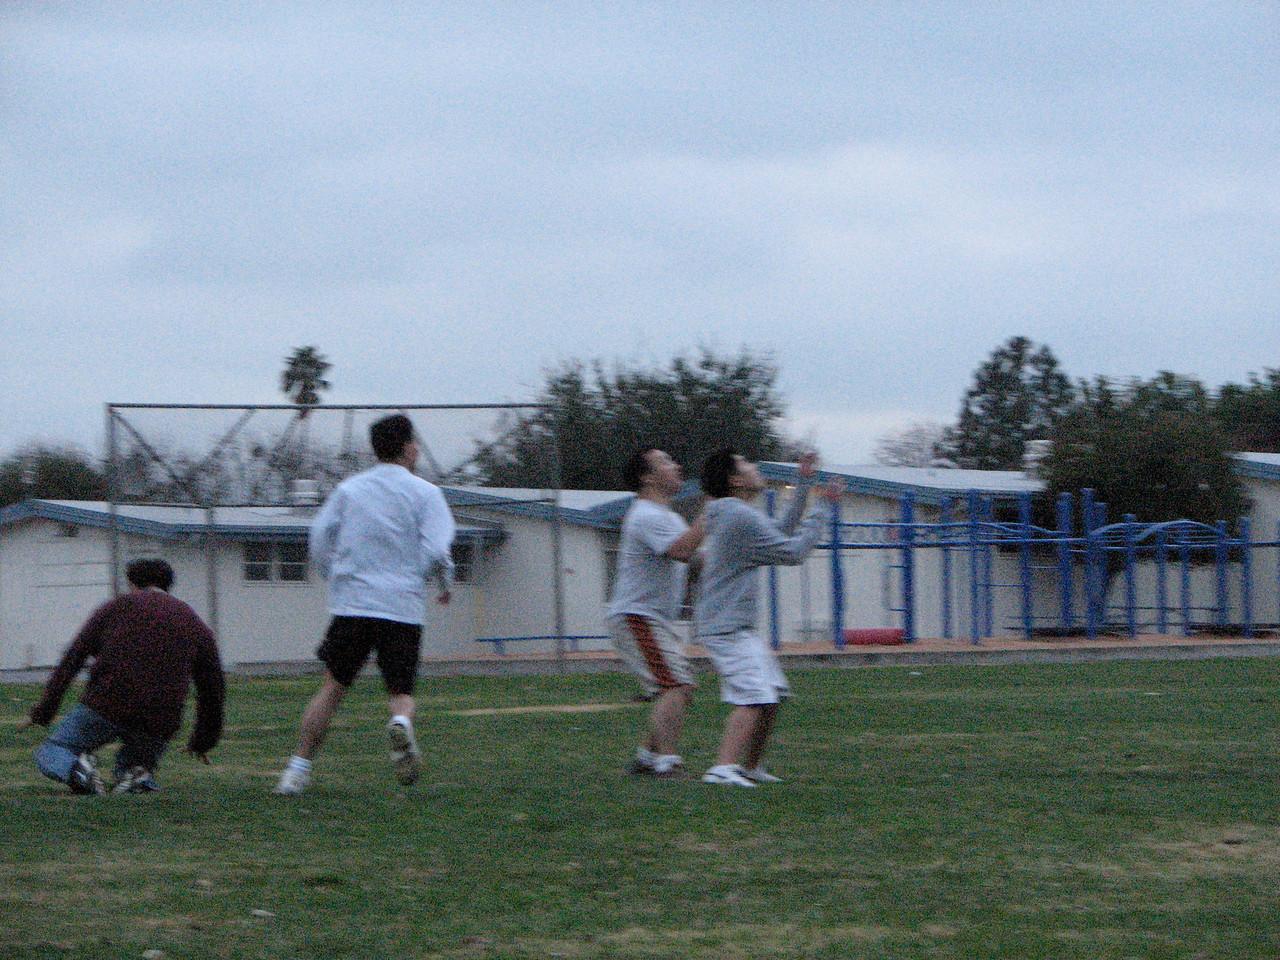 2006 12 31 Sun - Pastor Paul Lee & Paul Kang attempt to catch